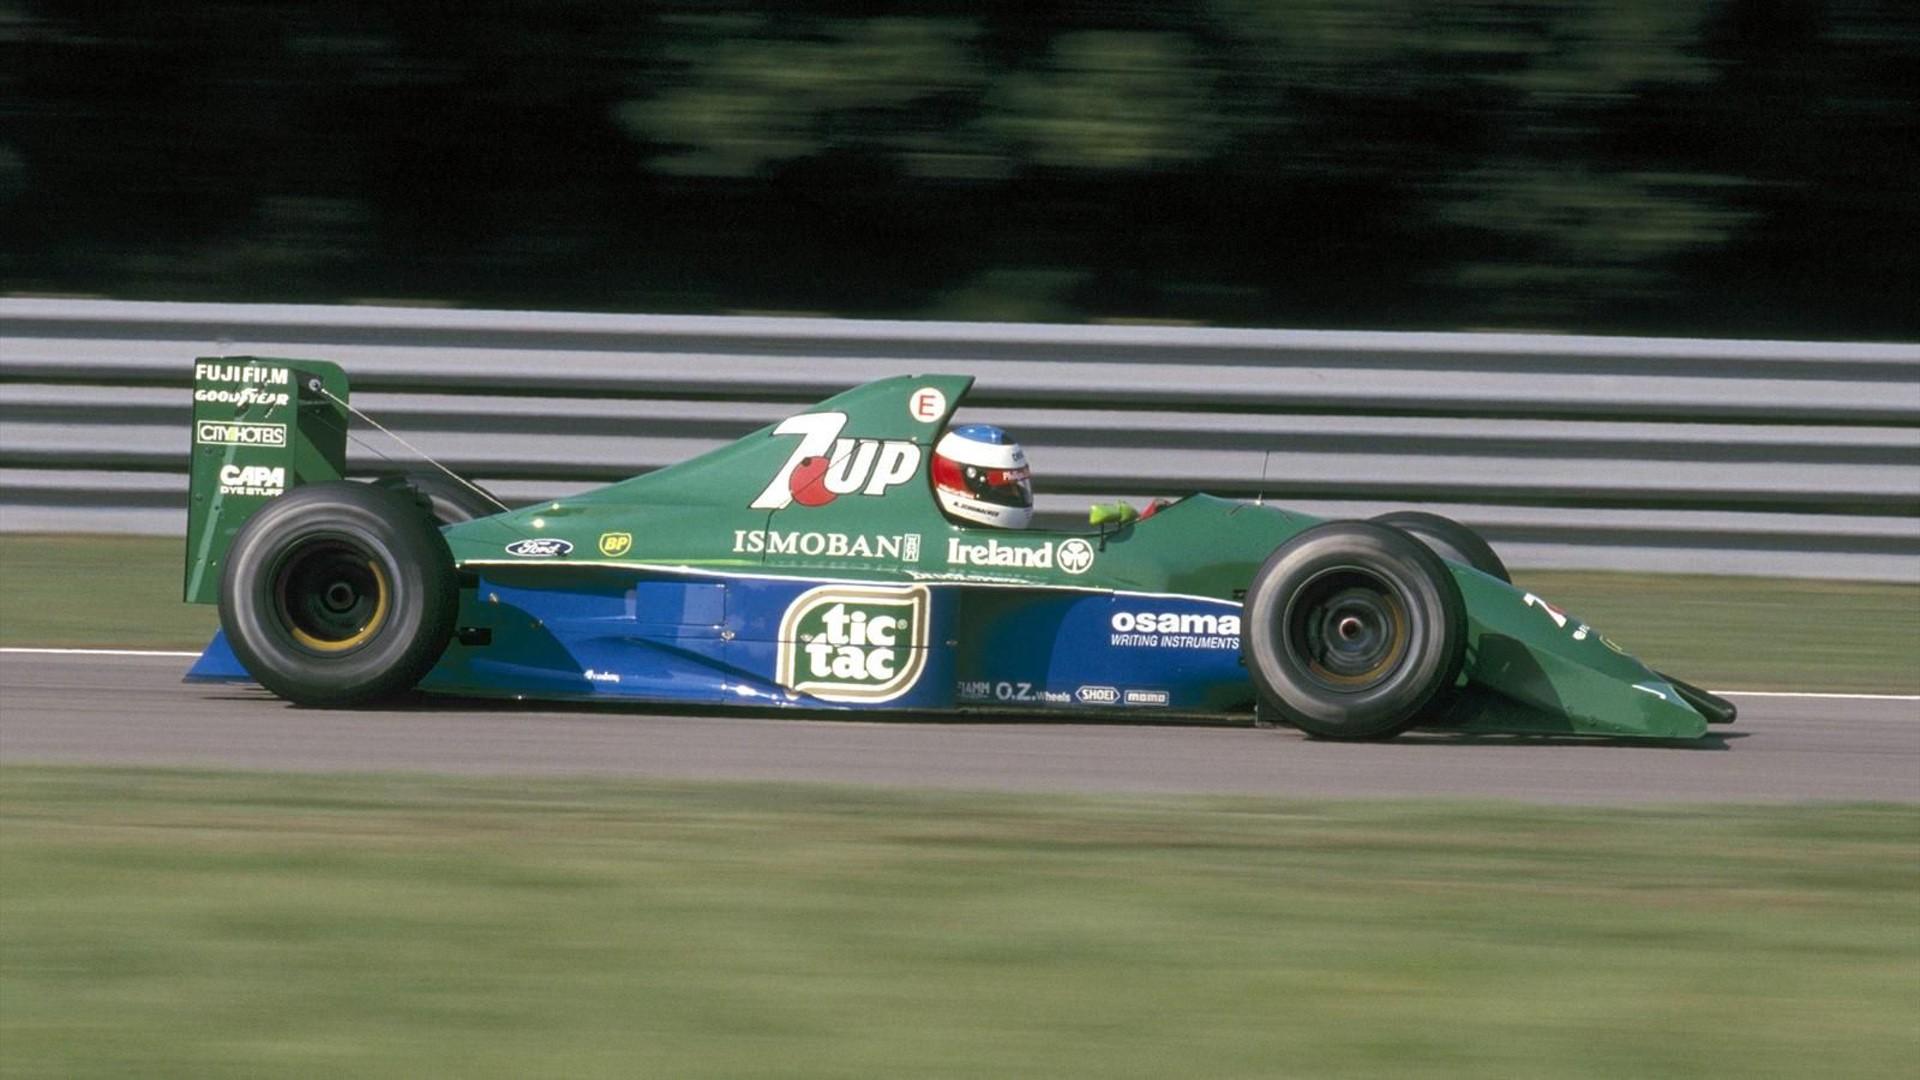 Michael_Schumacher_Jordan_F1_debut-0008